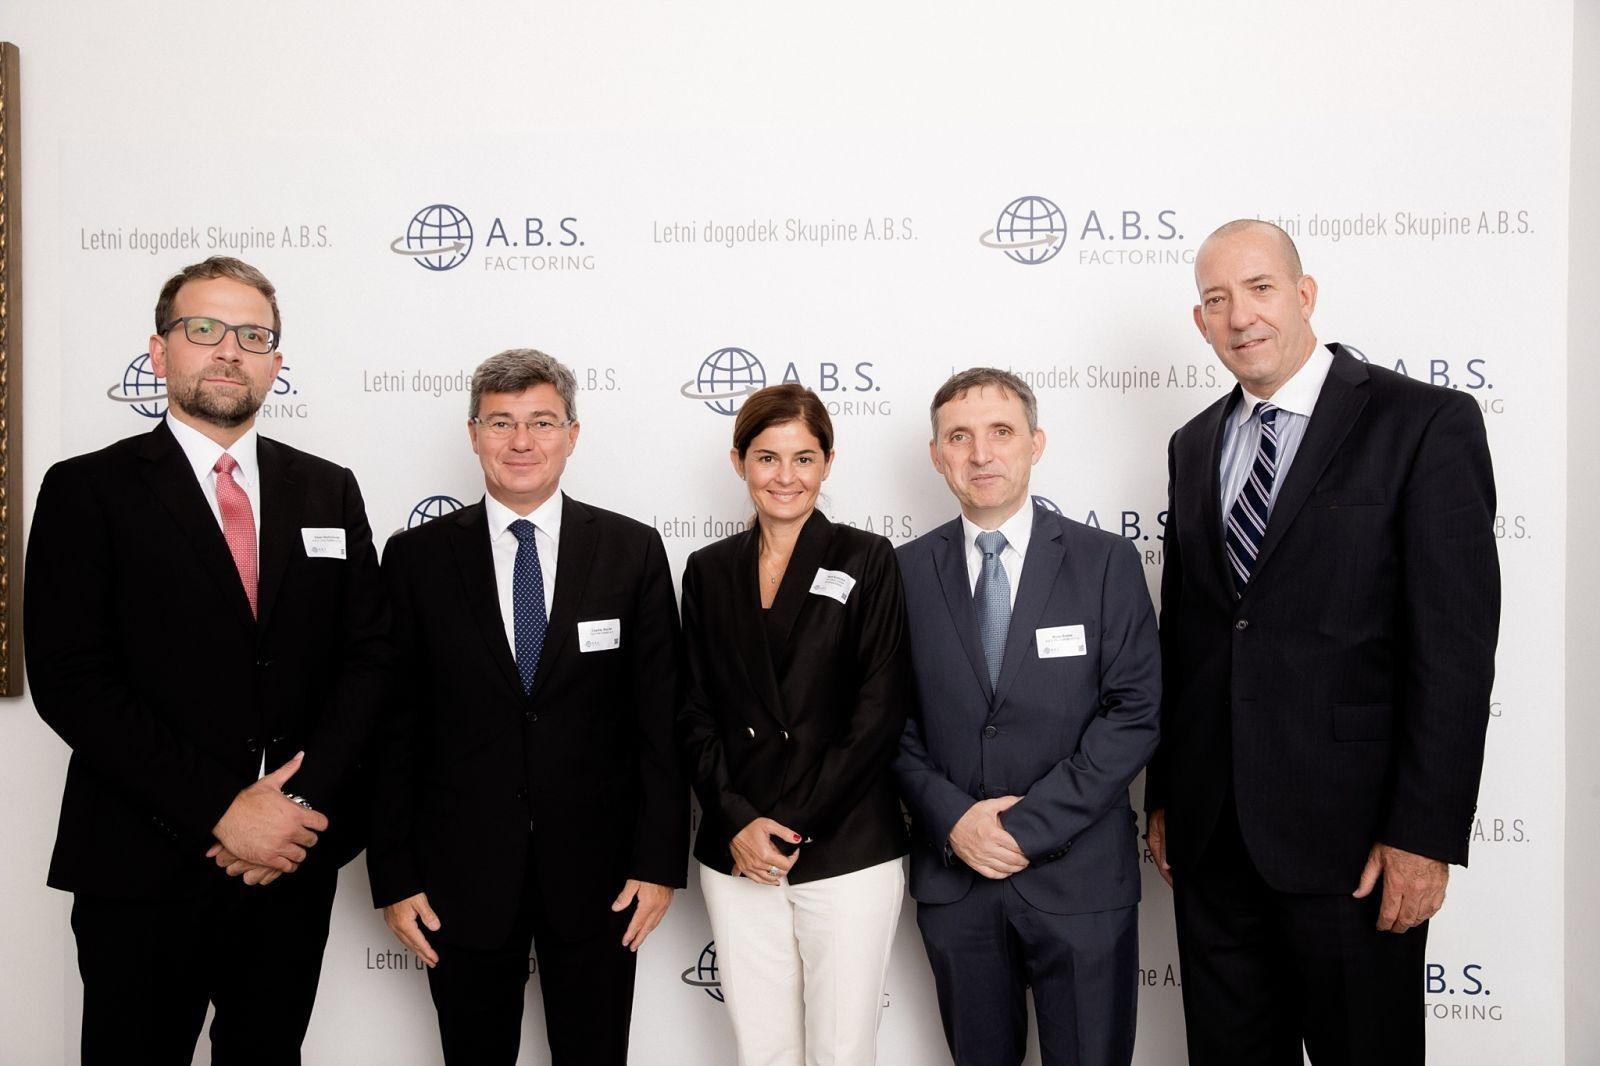 Letni dogodek Skupine A.B.S. 2019: Dejan Barbutovski, Çagatay Baydar, Betűl Kurtulus, Bojan Šuštar, Peter Mulroy